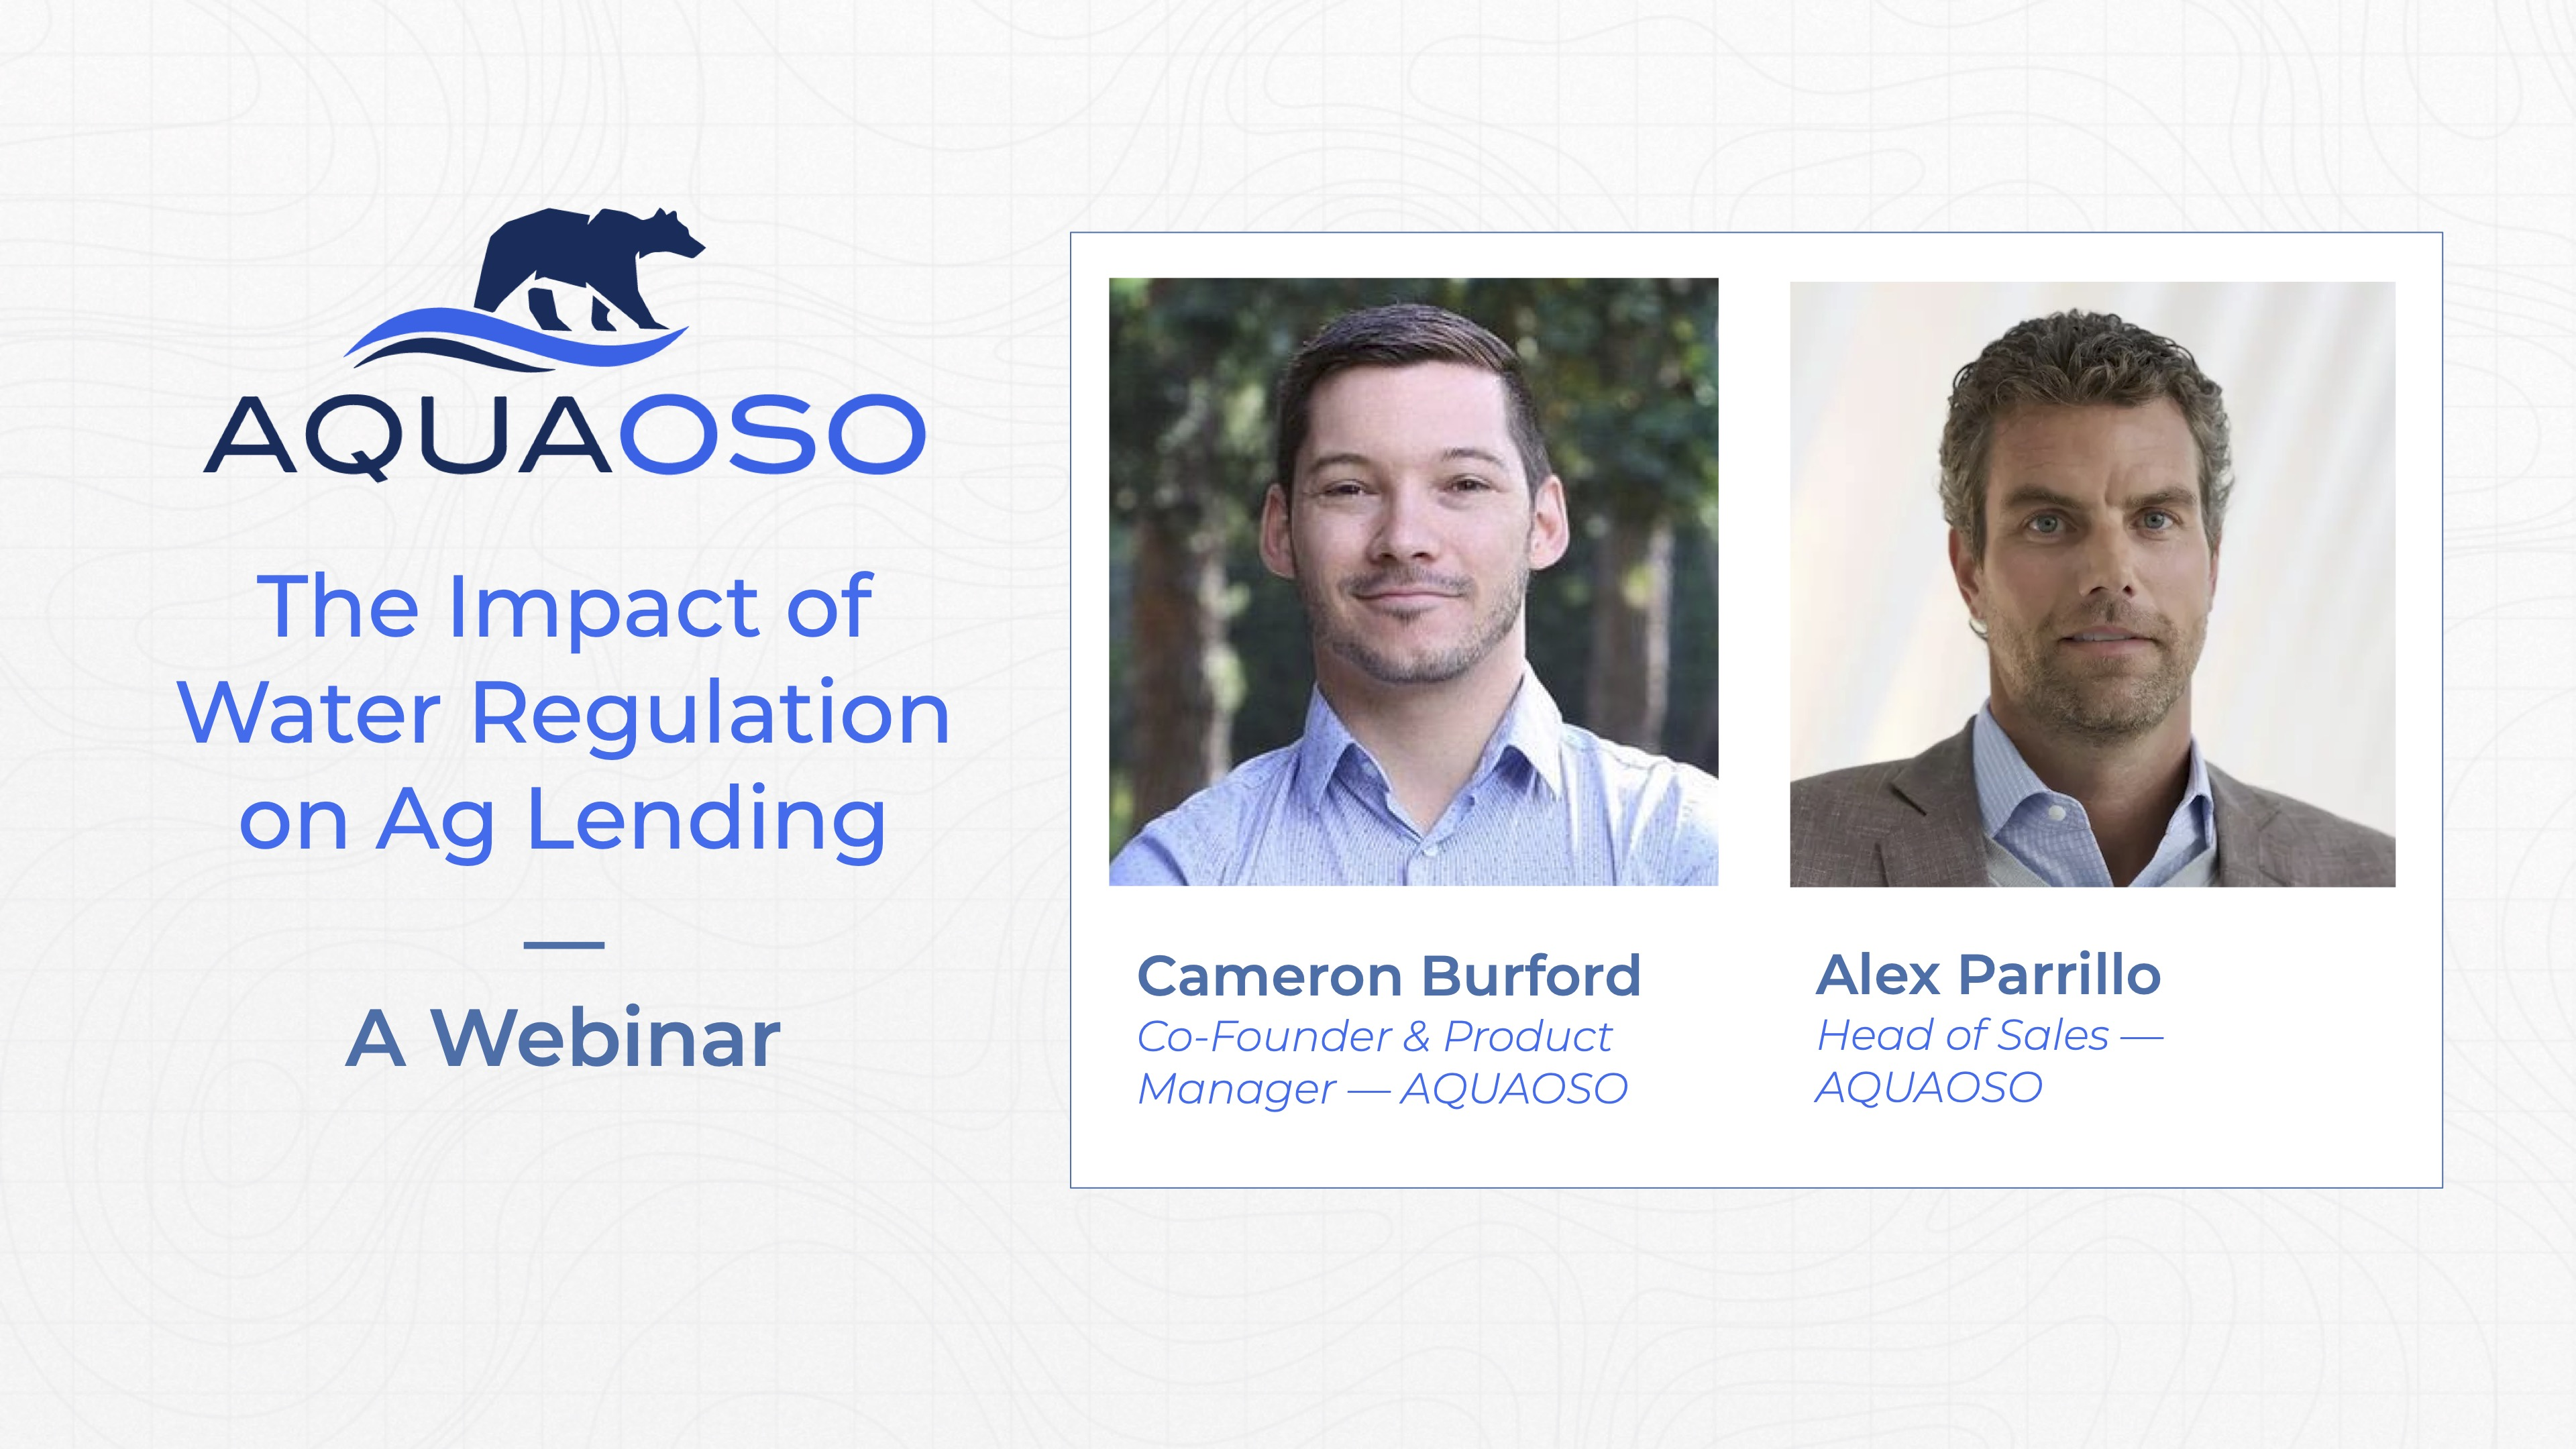 The Impact of Water Regulation on Ag Lending - Webinar Slides By AQUAOSO